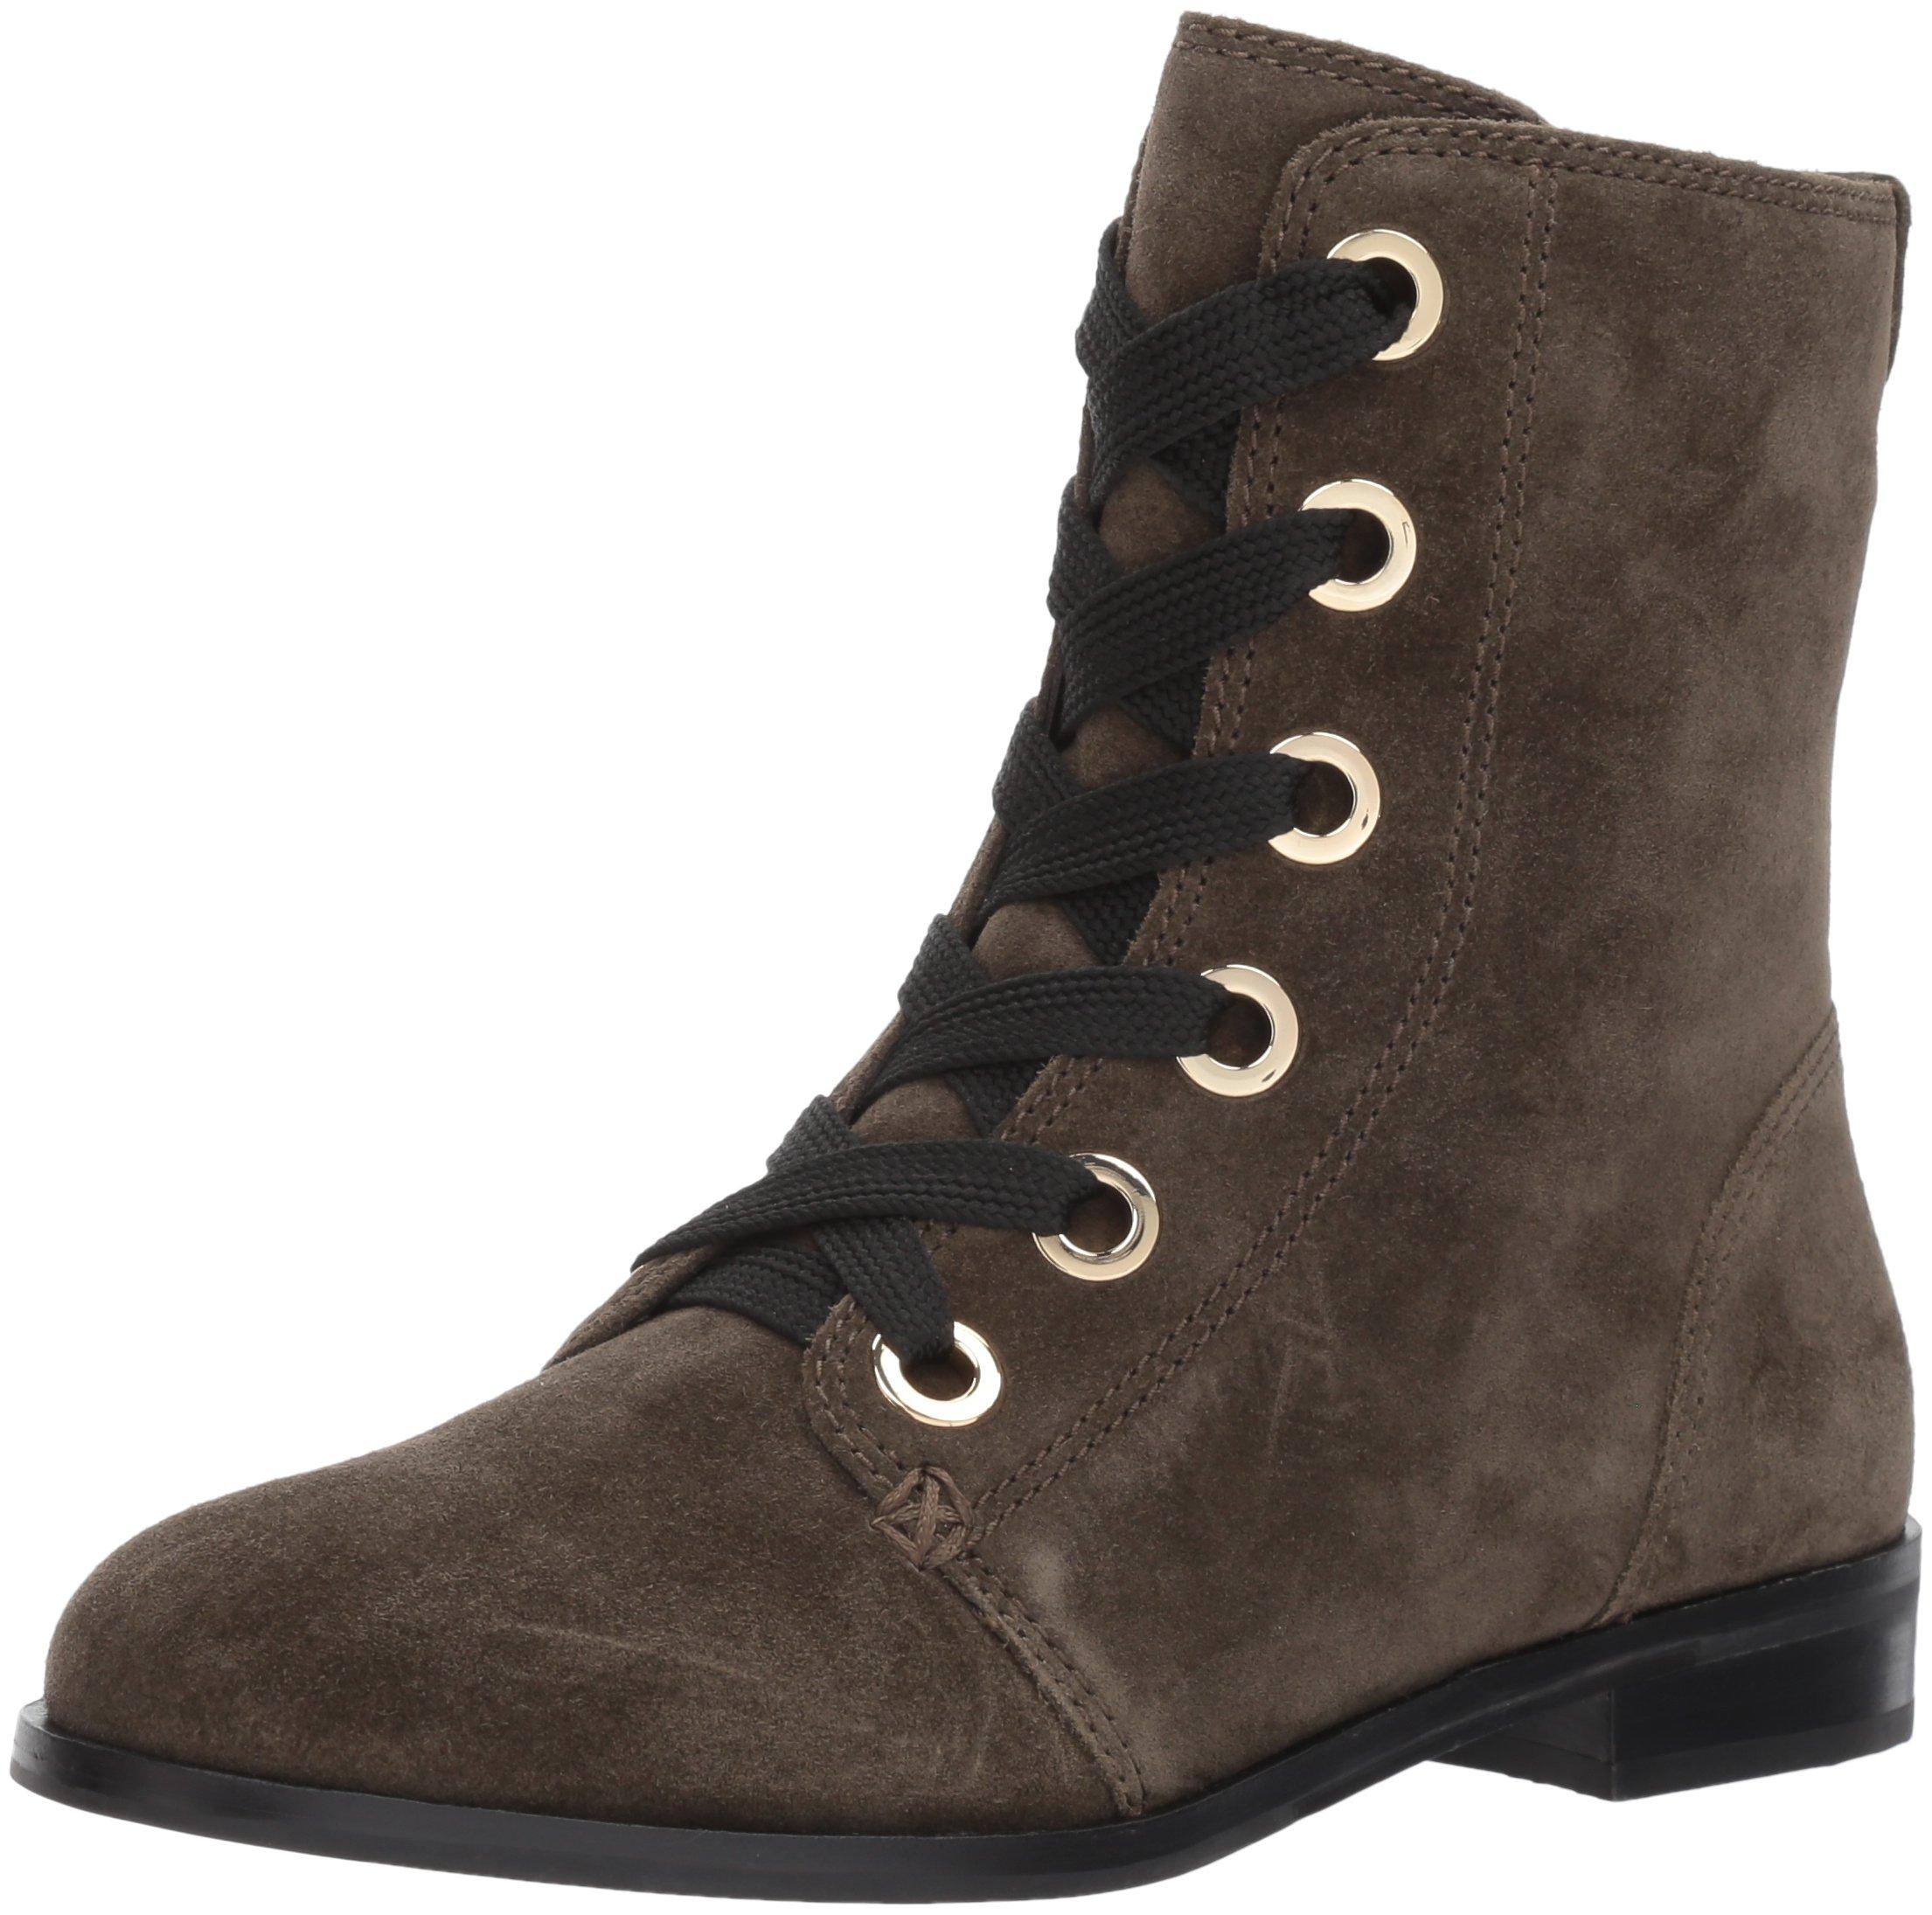 kate spade new york Women's Raquel Fashion Boot, Green, 8 Medium US